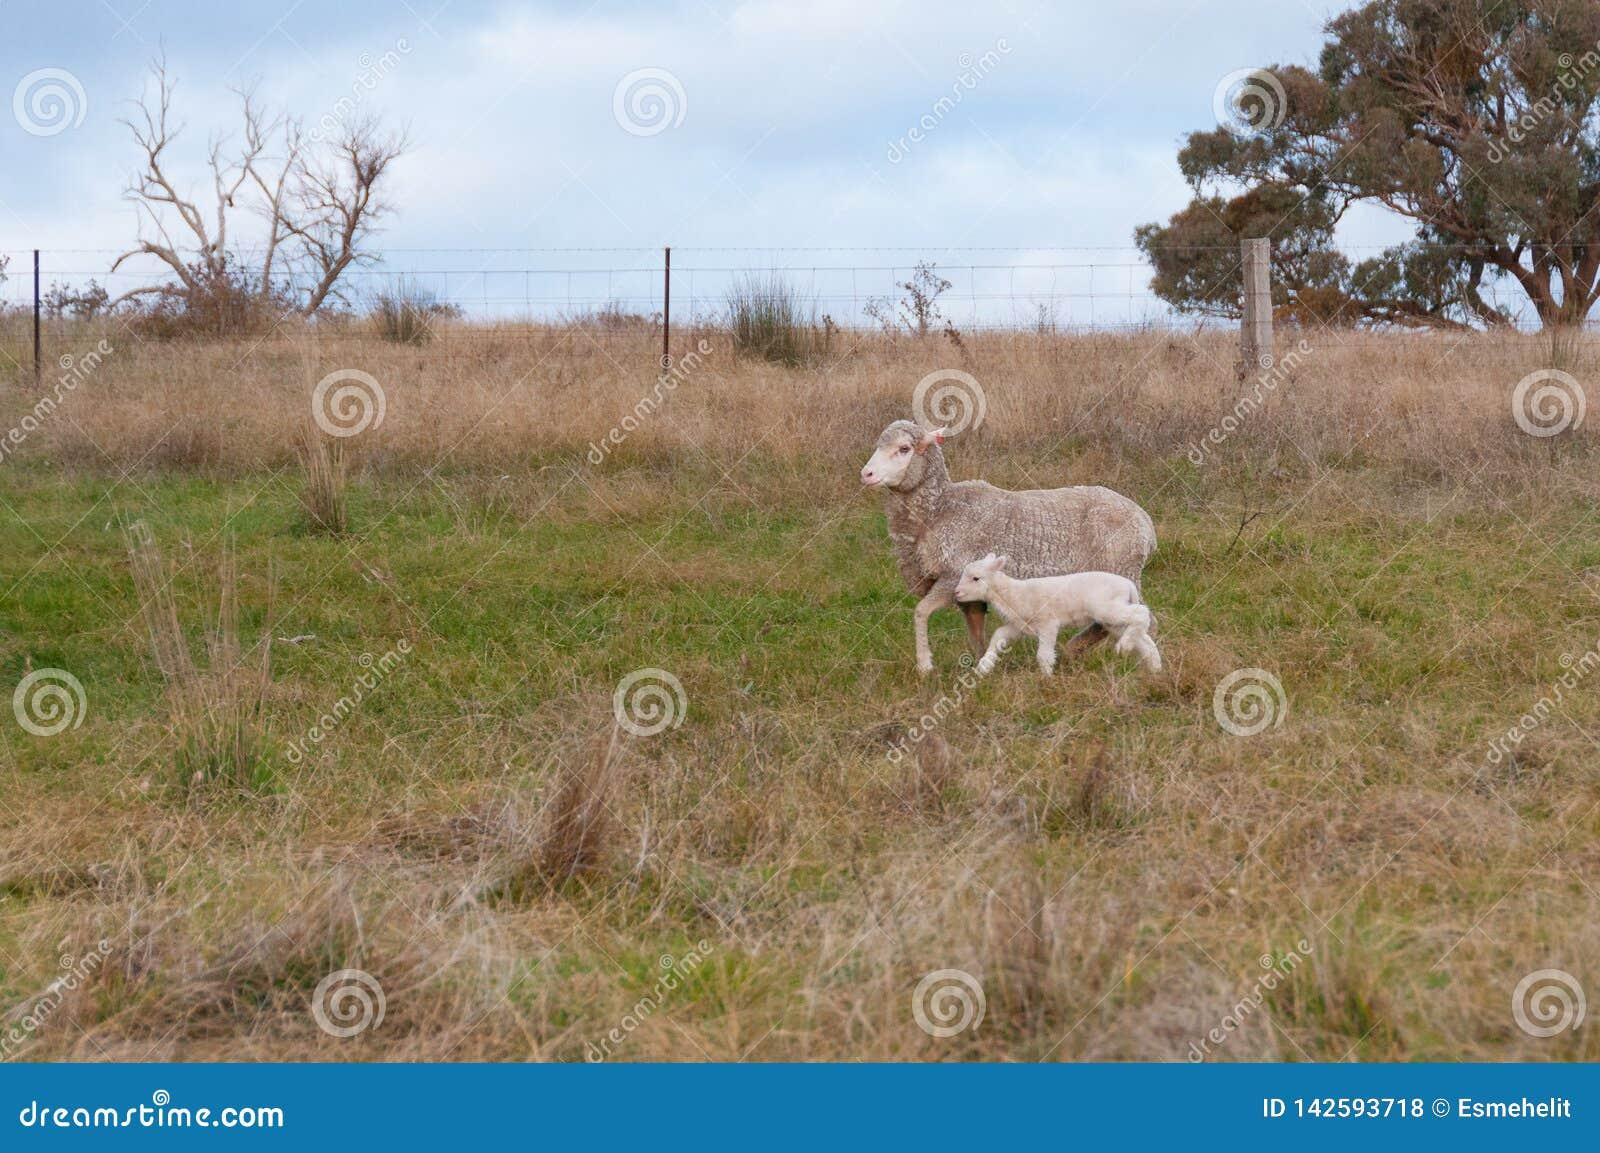 Ewe sheep with baby lamb on a paddock. Farm animals background